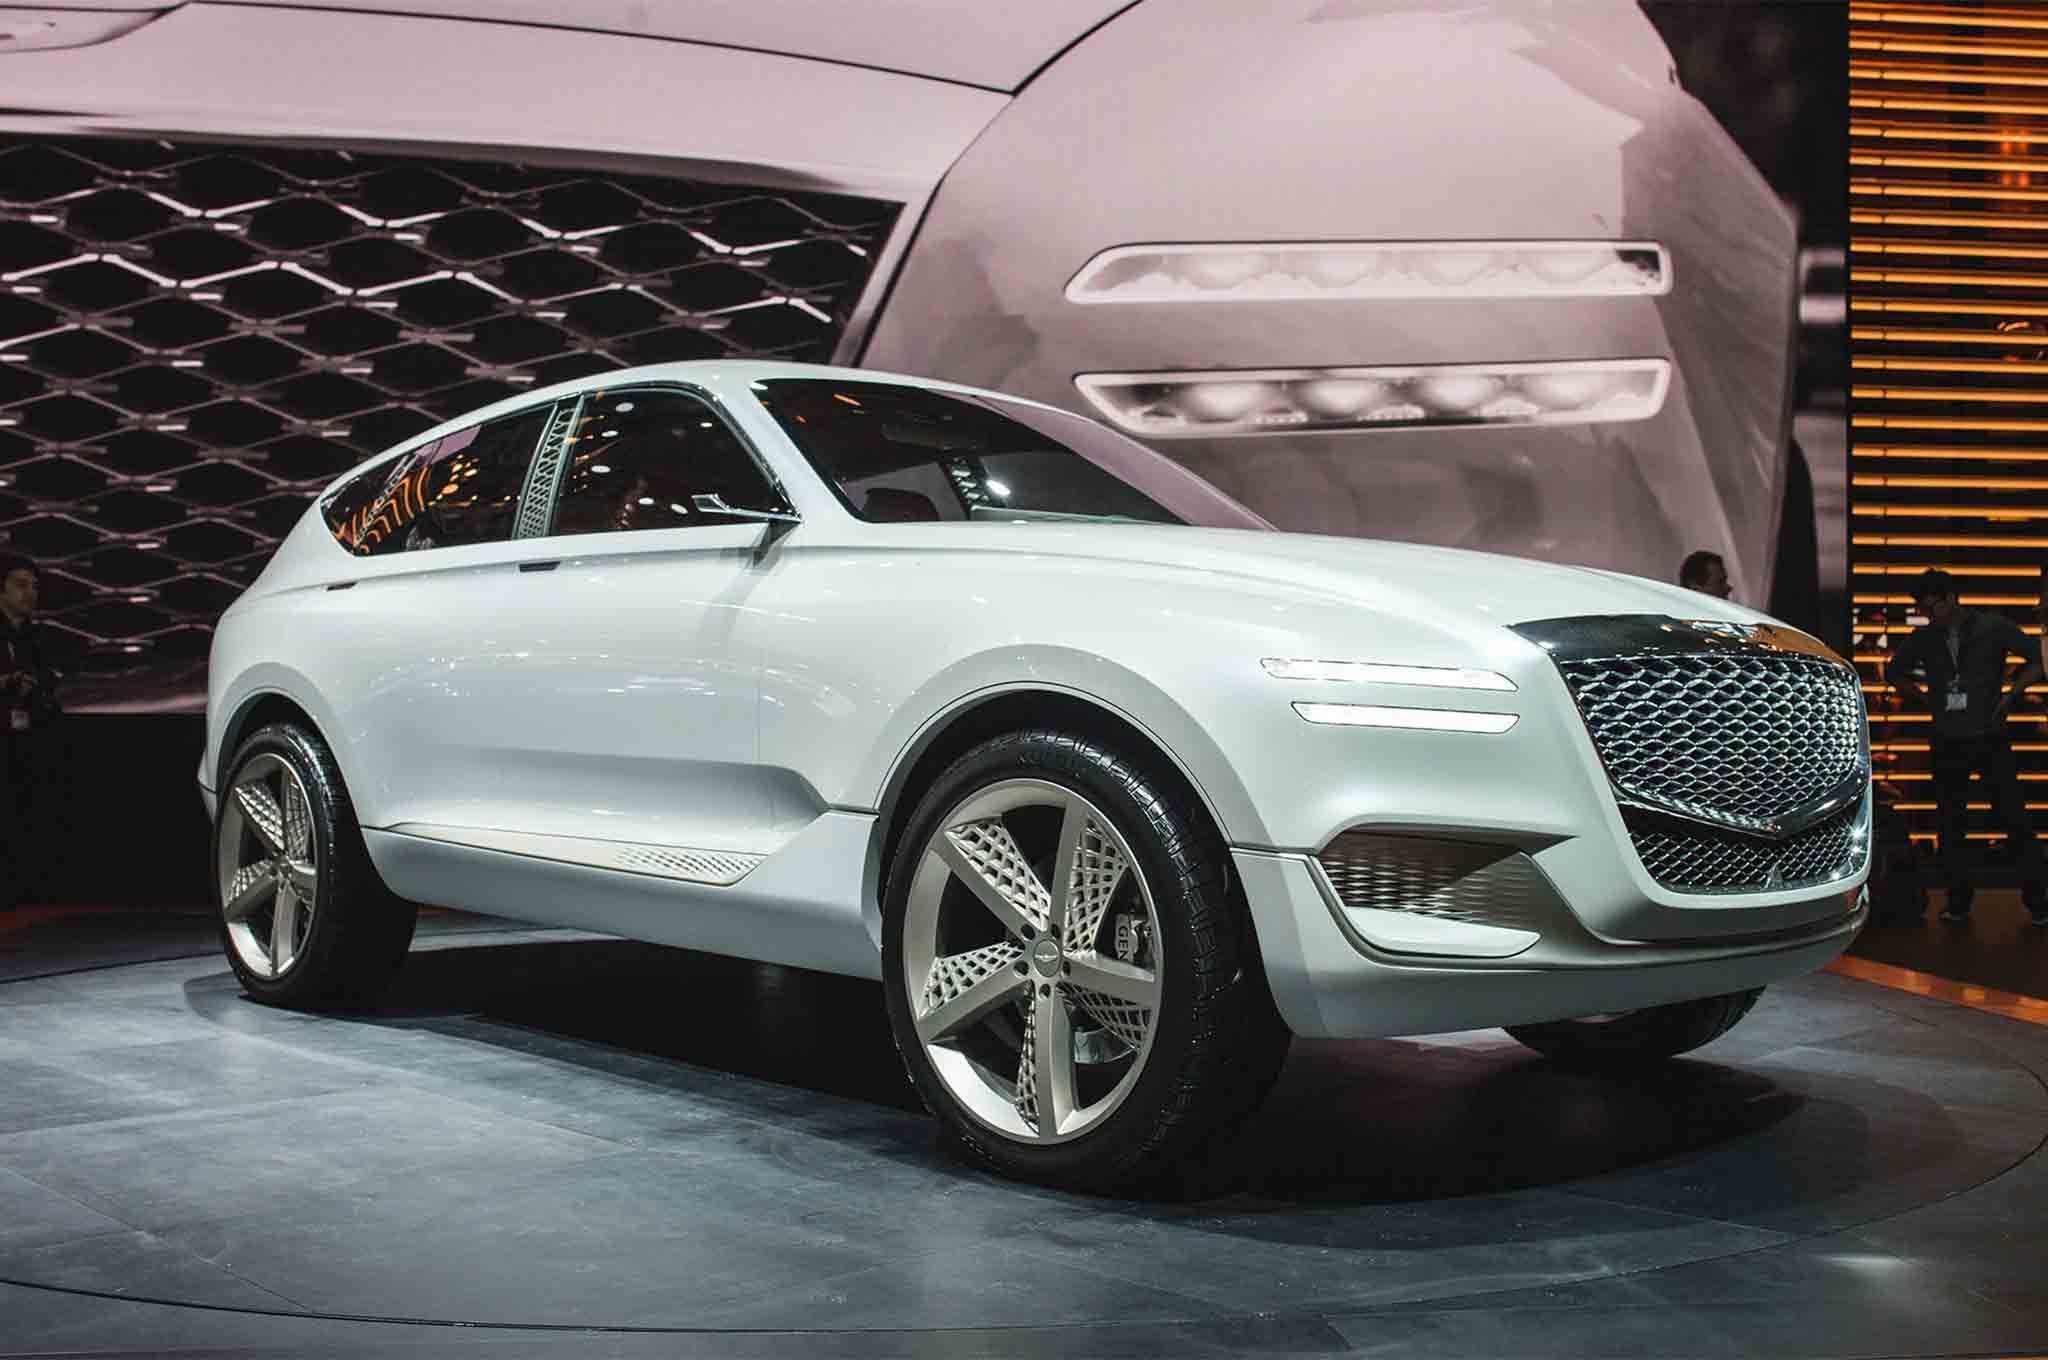 Hyundai s luxury sub brand Genesis decided to surprise the party